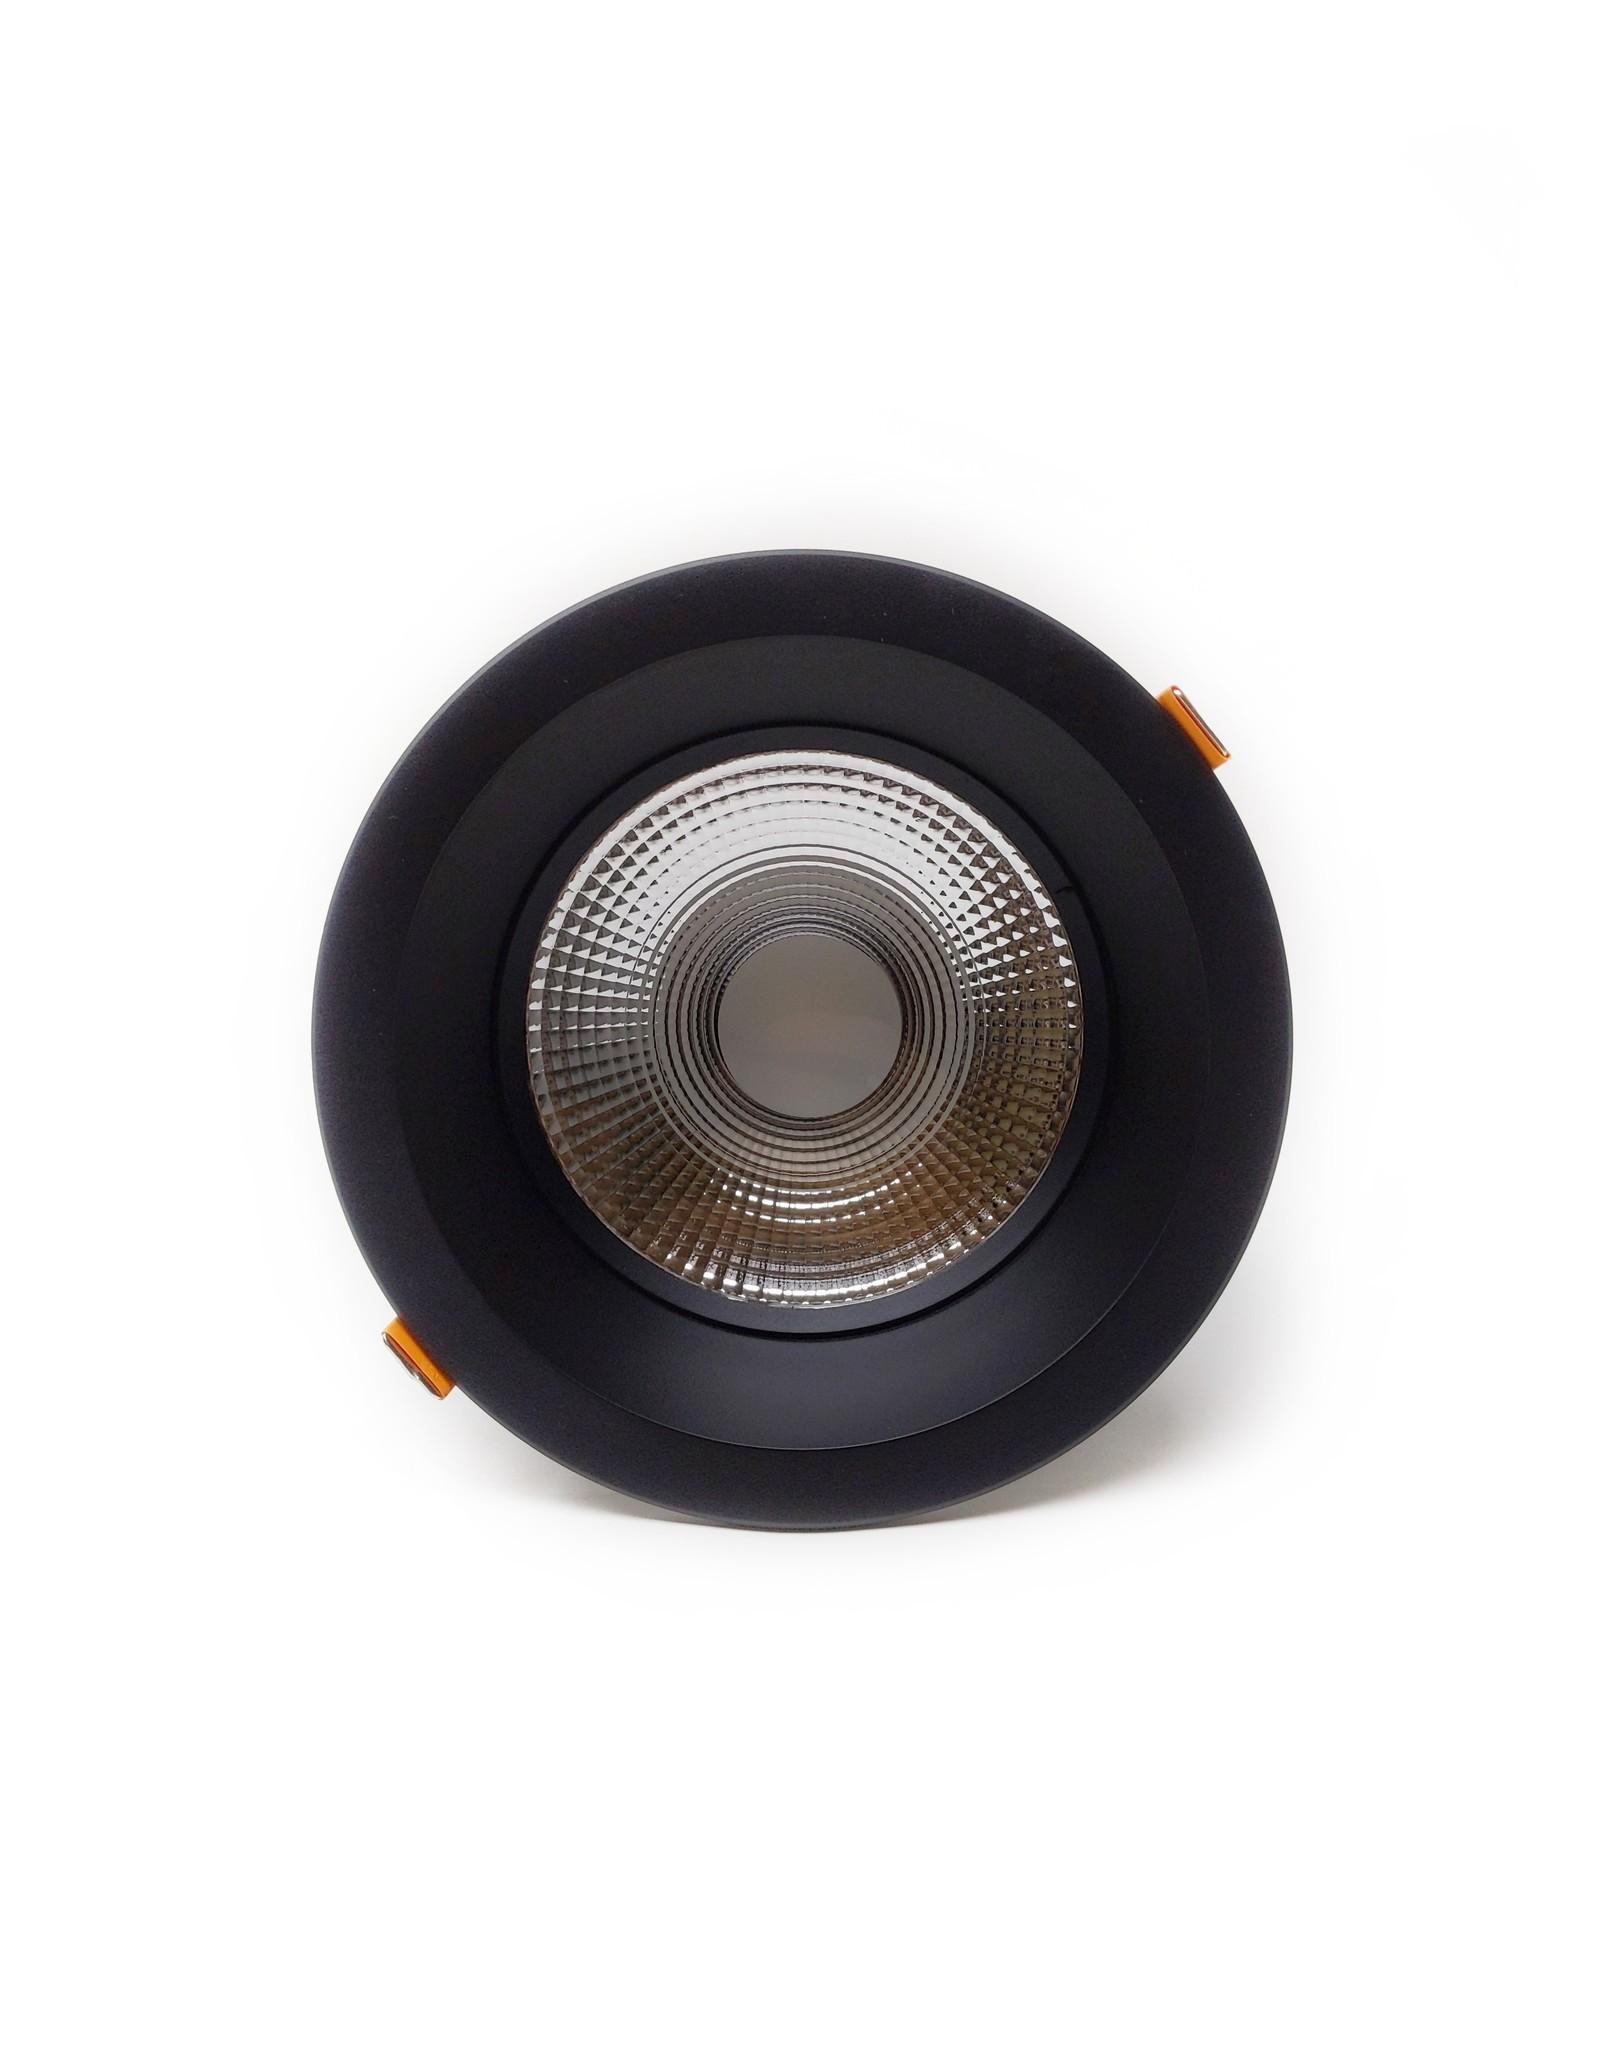 LedLed Glare Dowlight ZWART 4000k 145mm 8-12W gatmaat 125mm